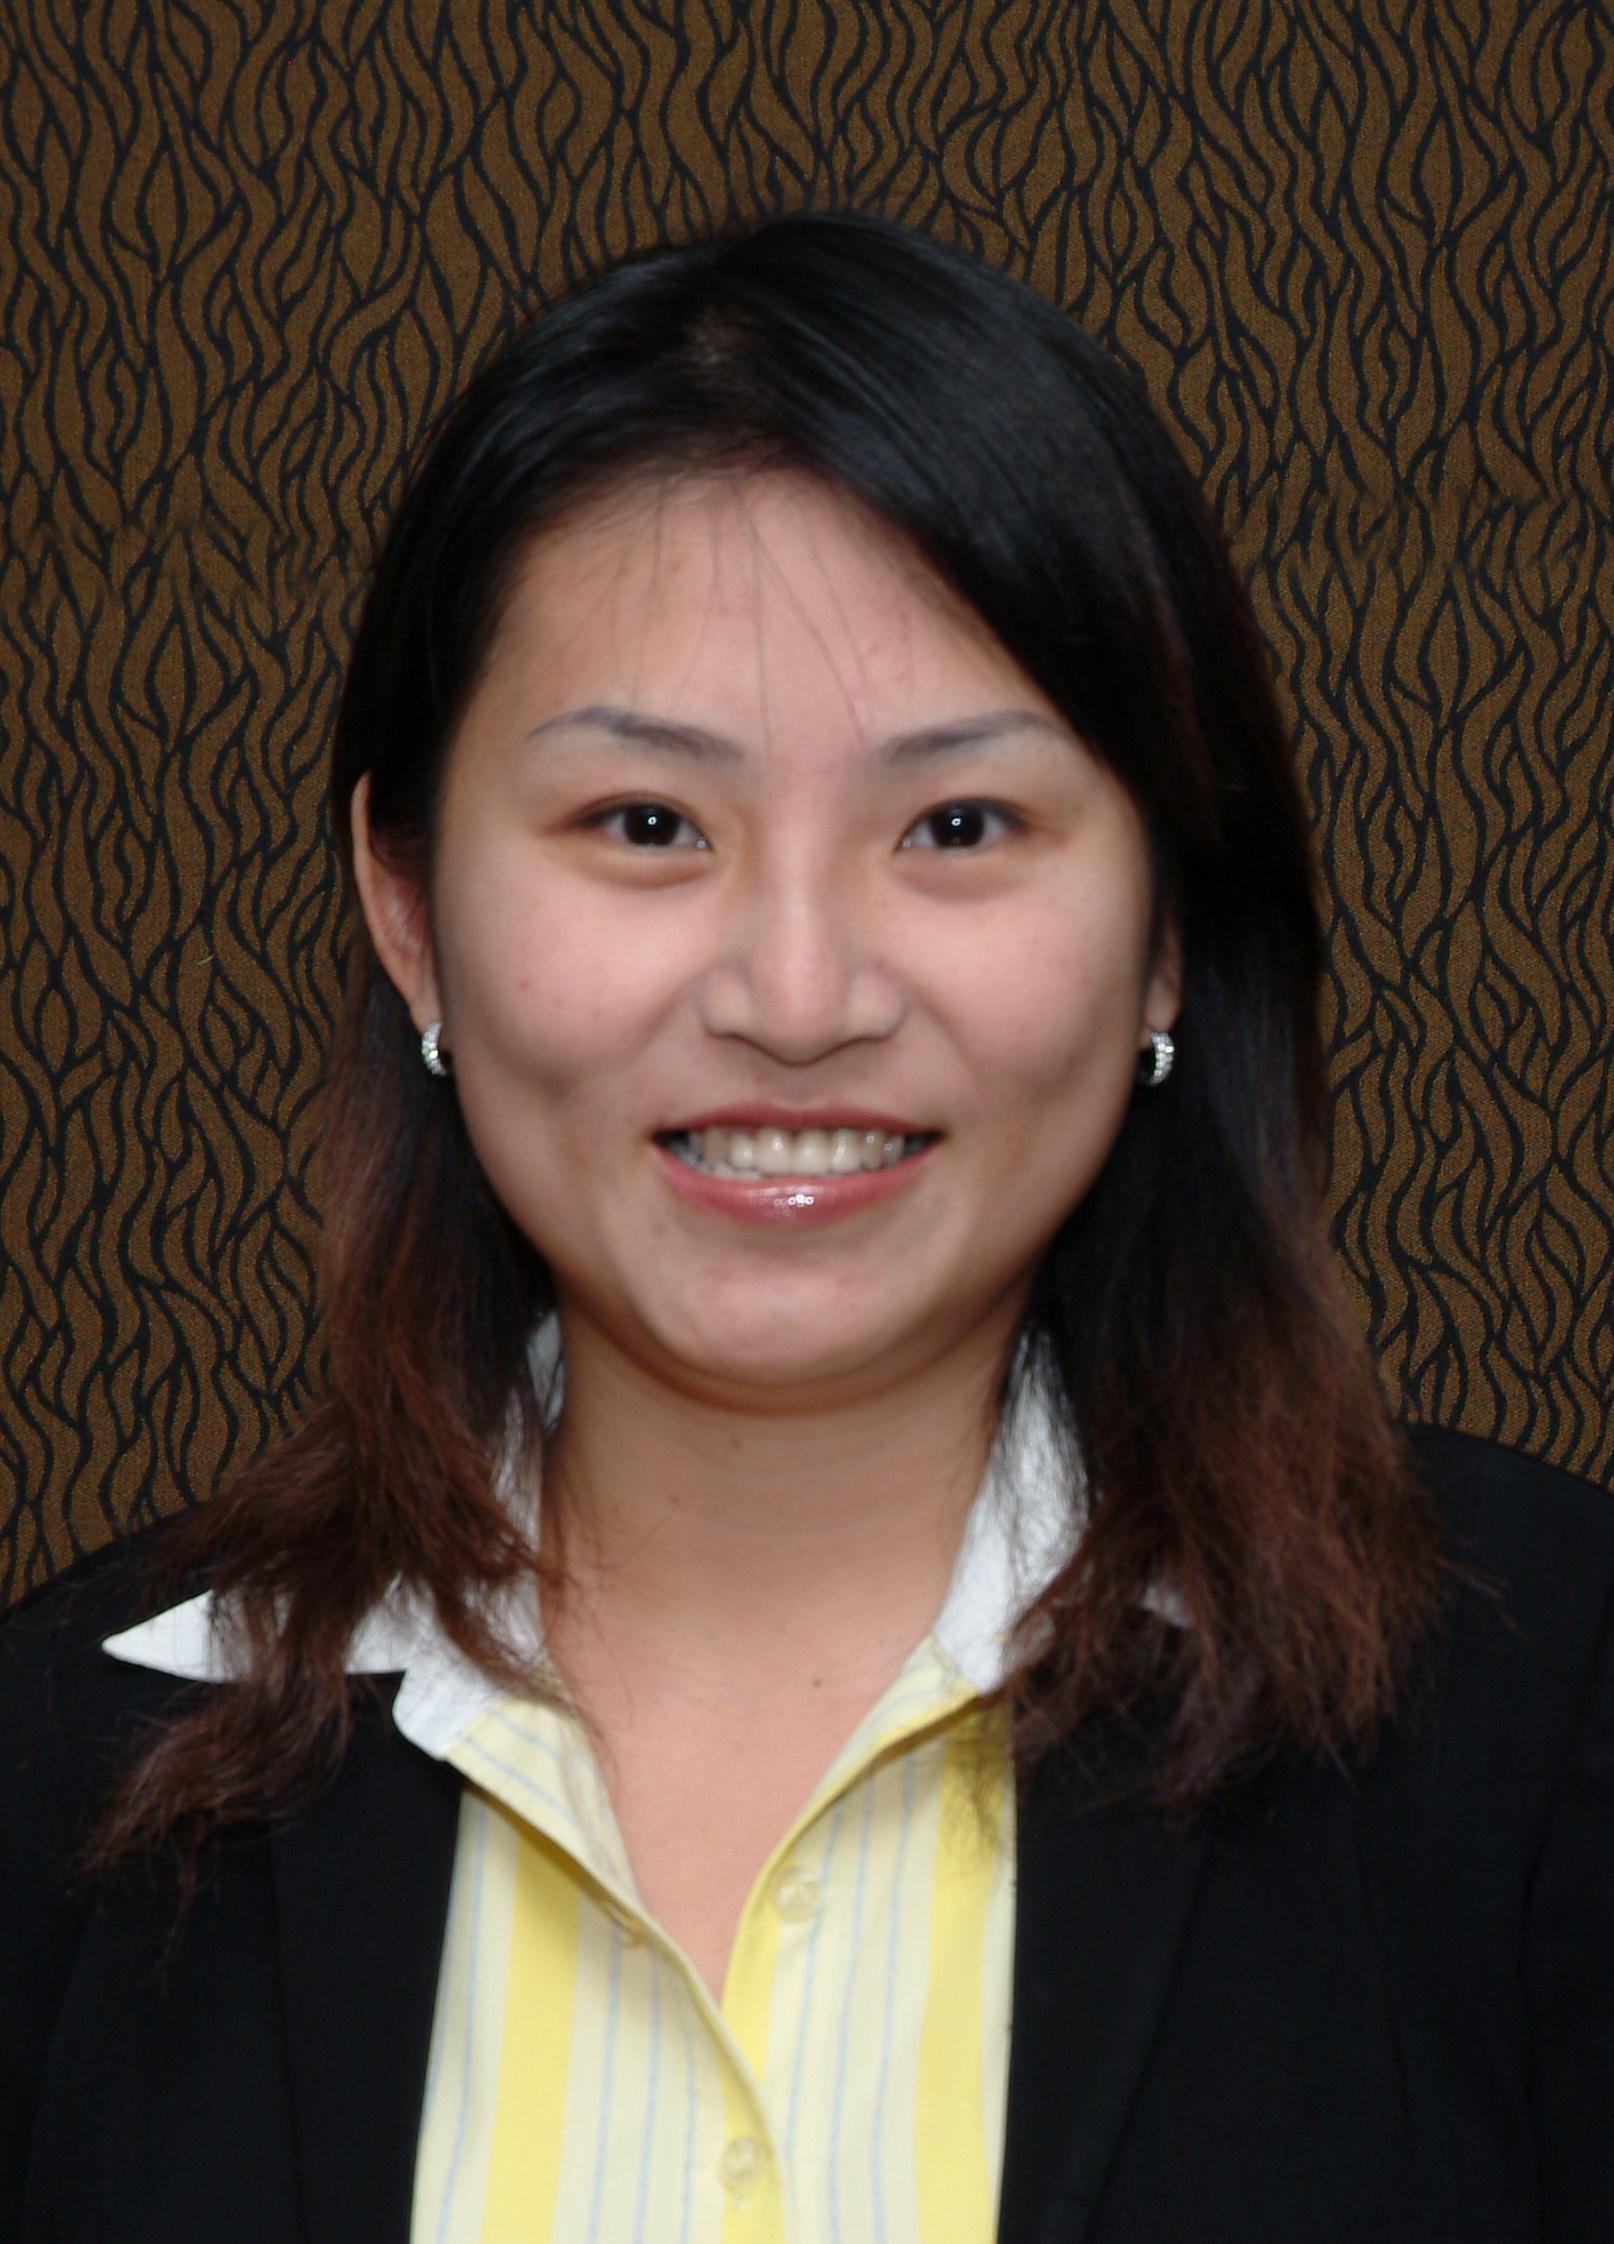 Irien Tan